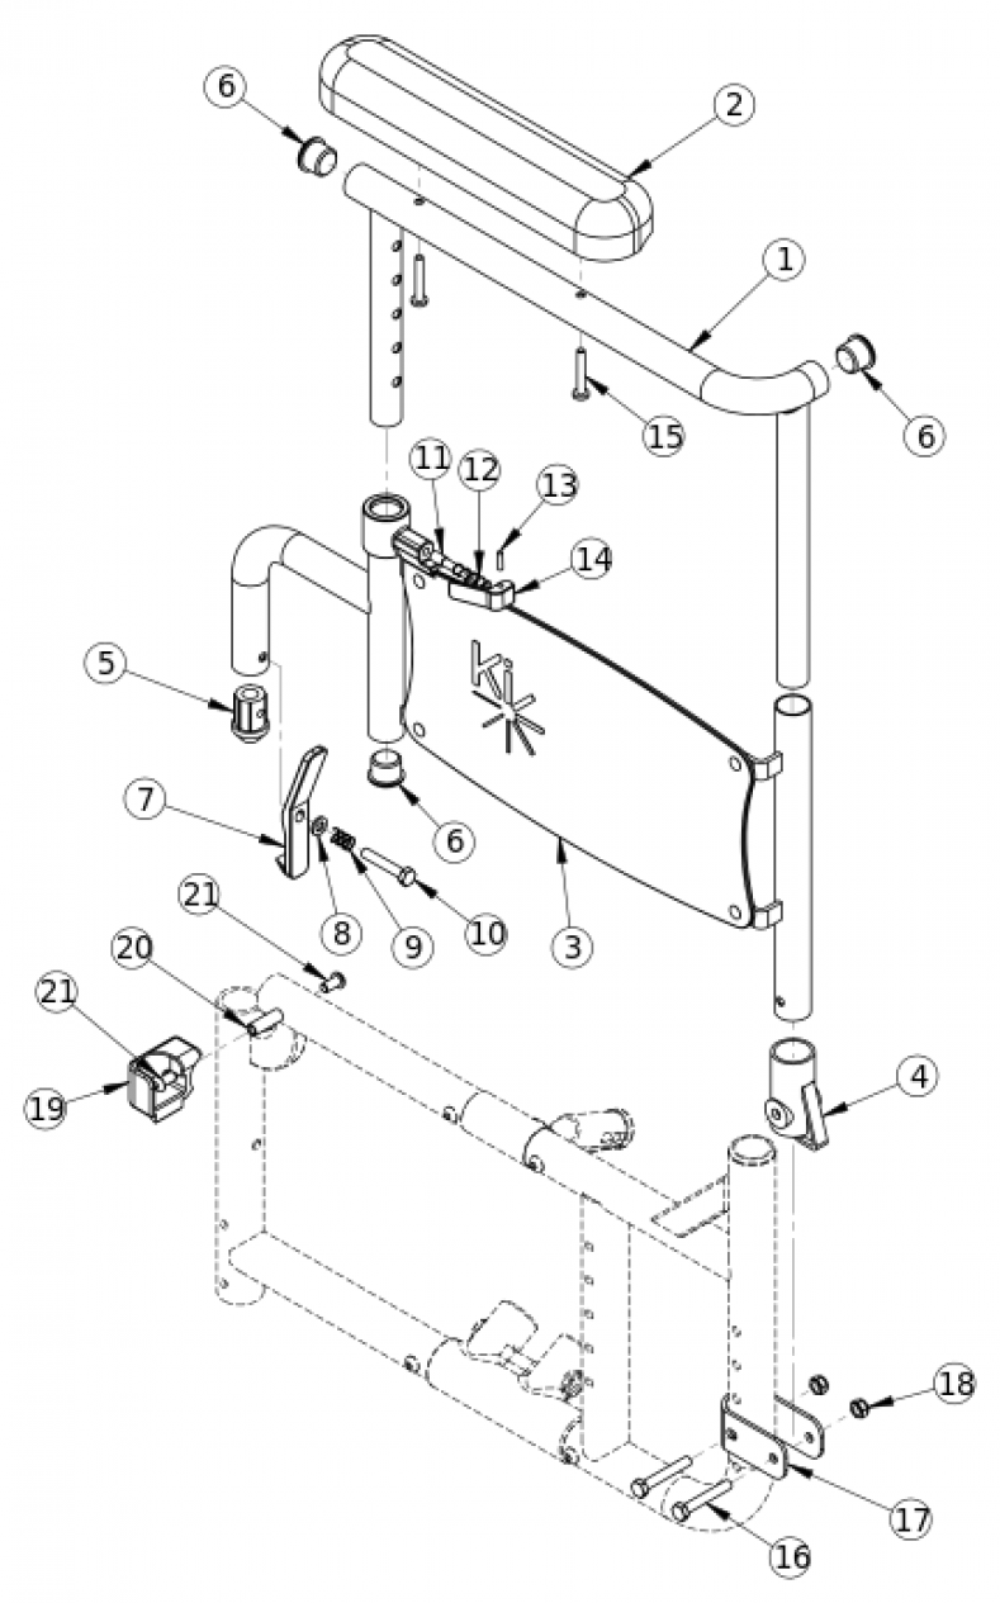 Discontinued Catalyst 4 Height Adjustable Flip Back Armrest parts diagram